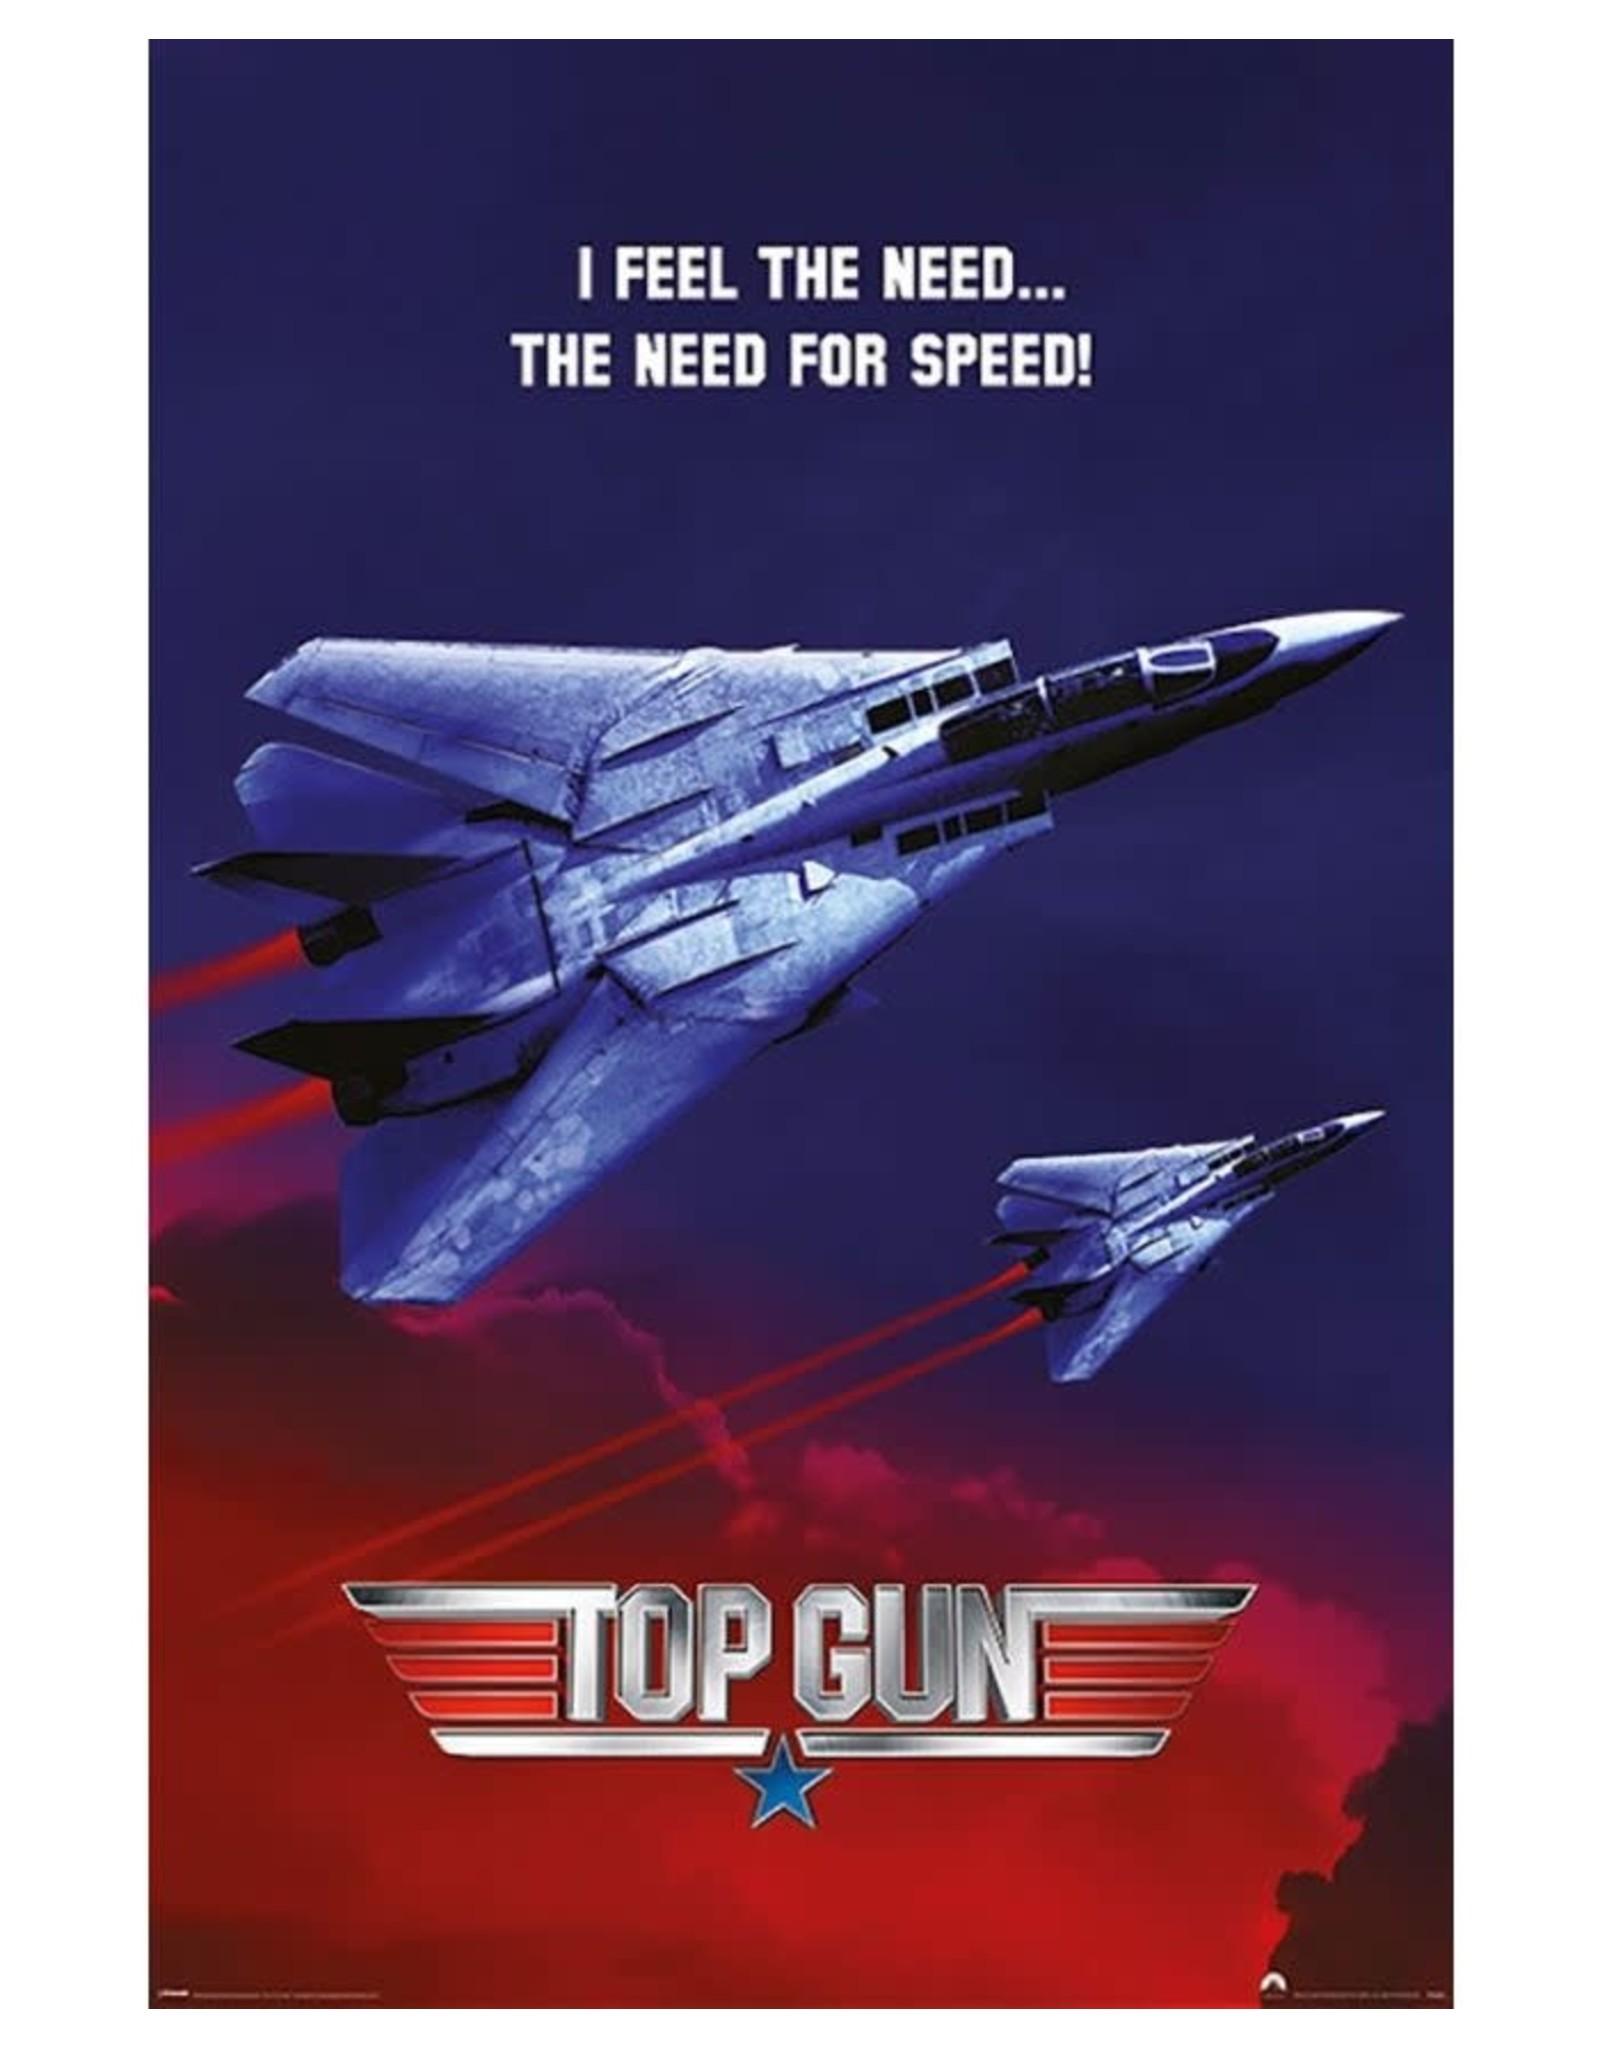 Movie Night at the Museum - Top Gun